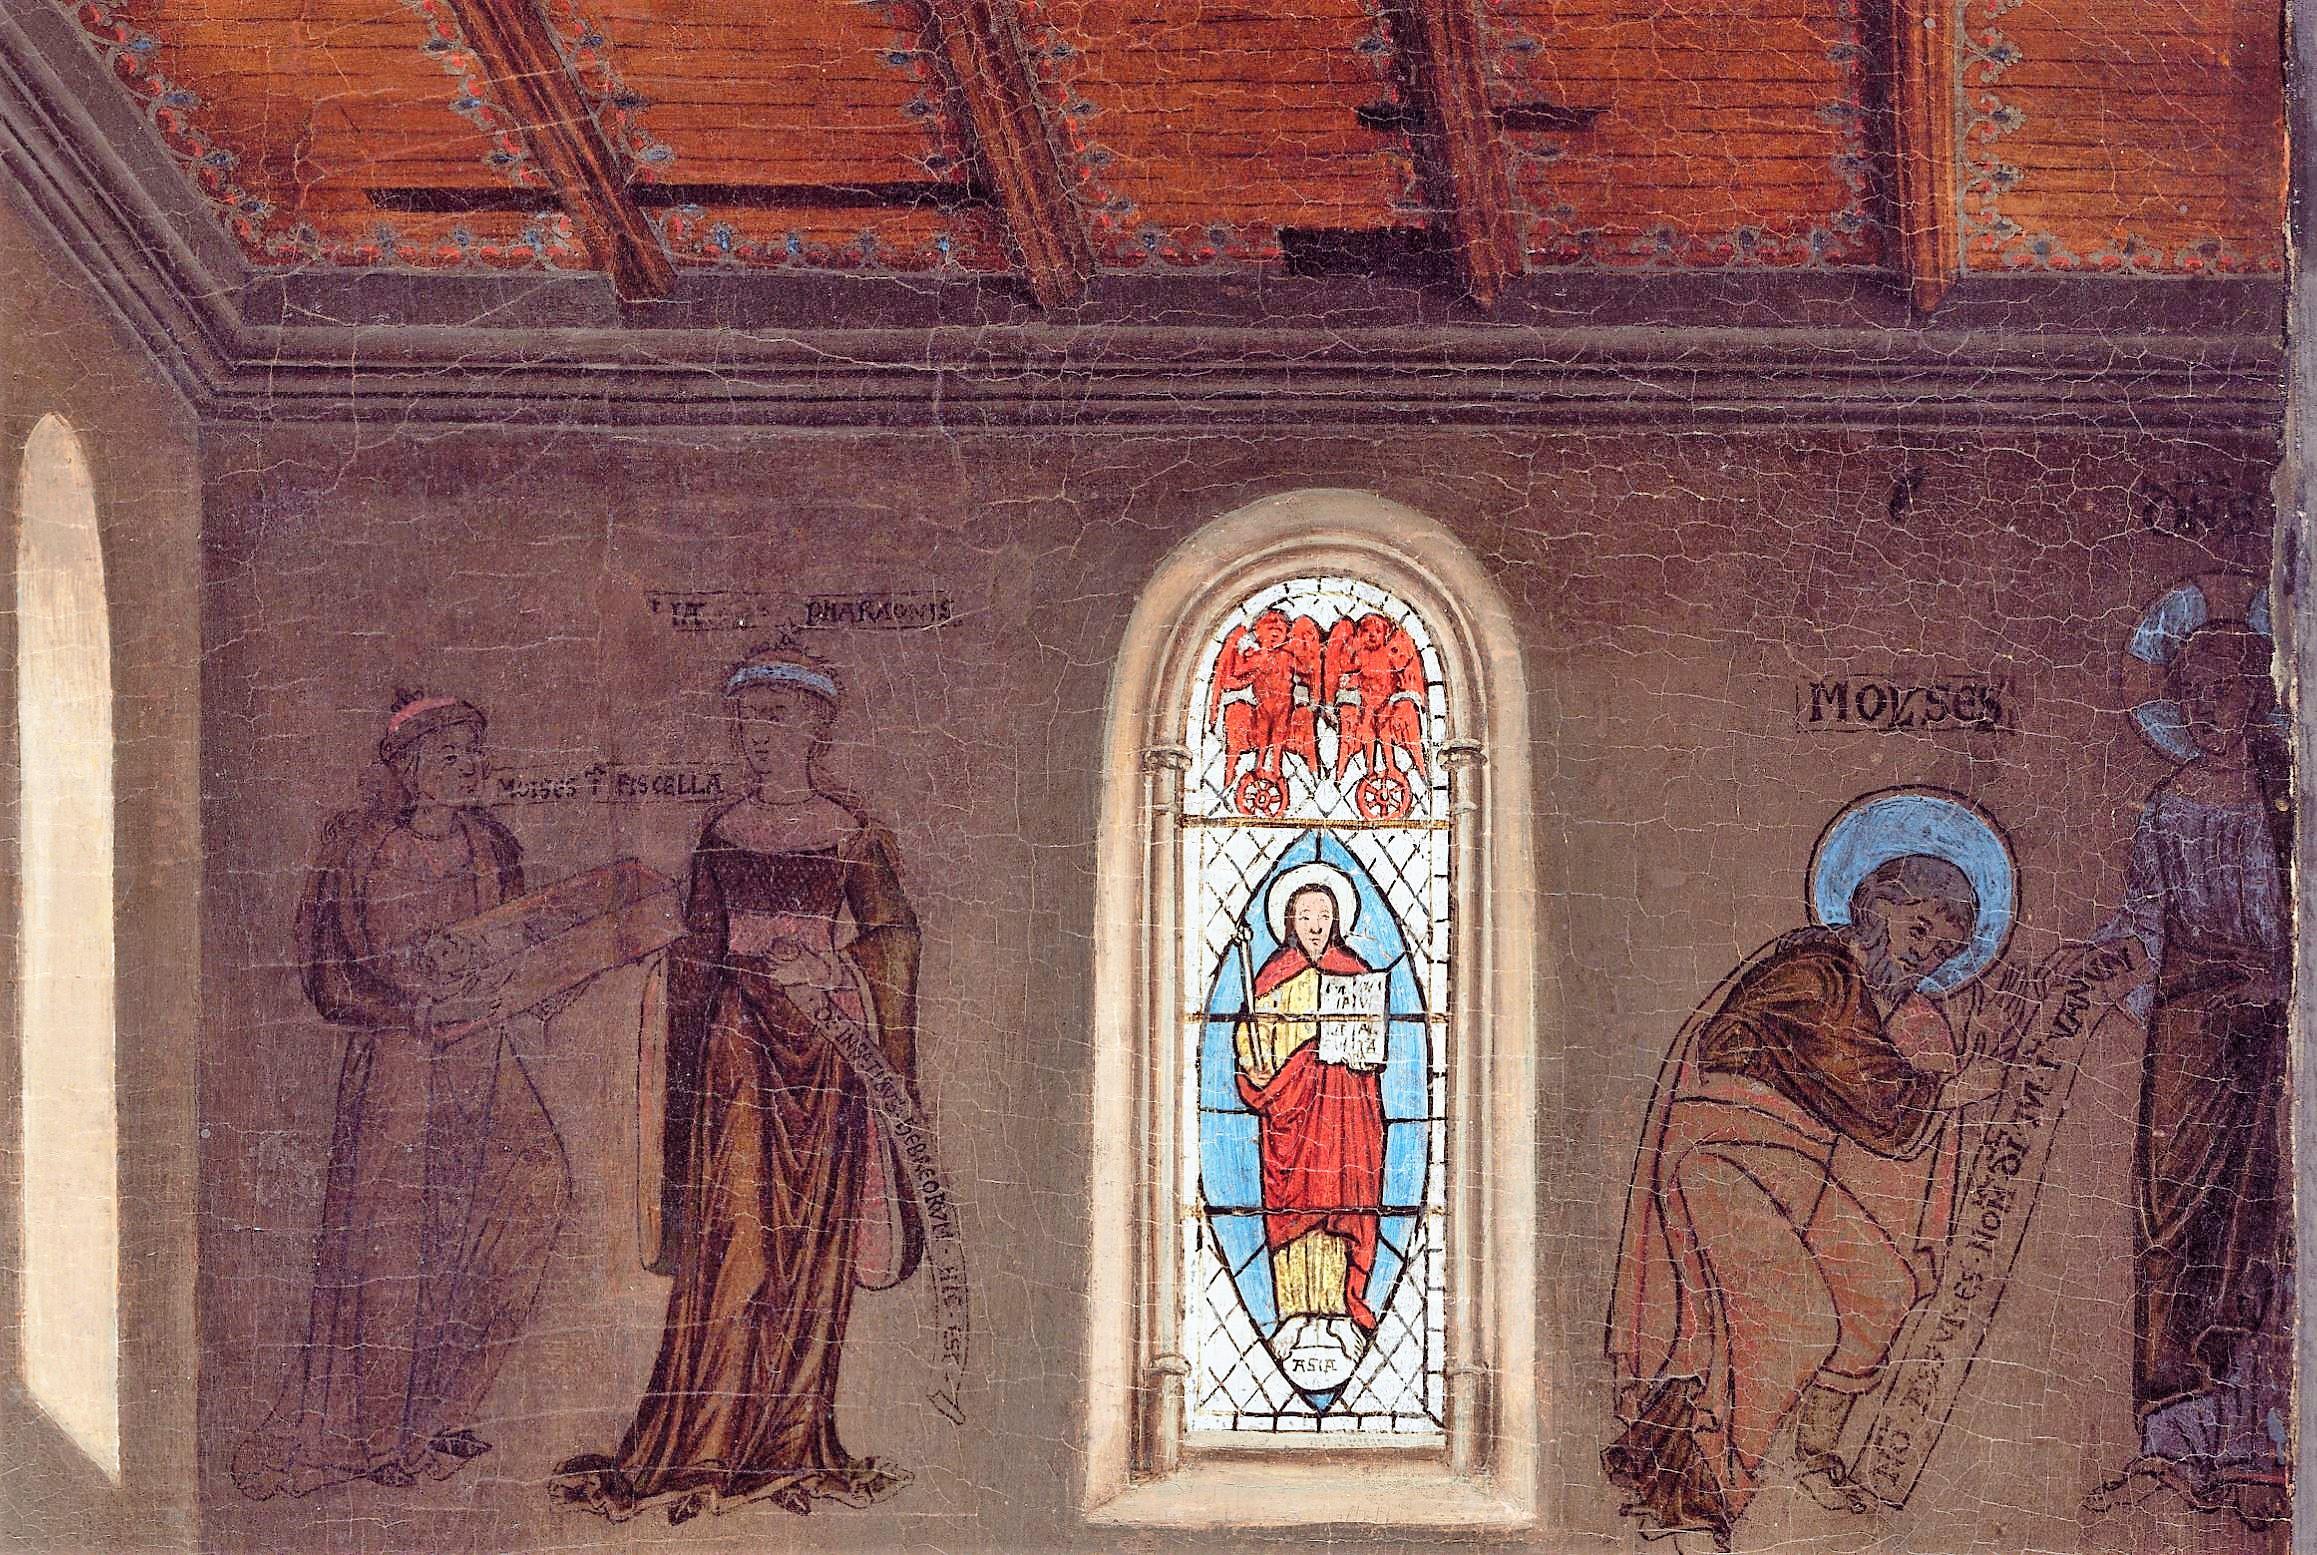 Van Eyck Annonciation 1434-36 NGA scenes haut